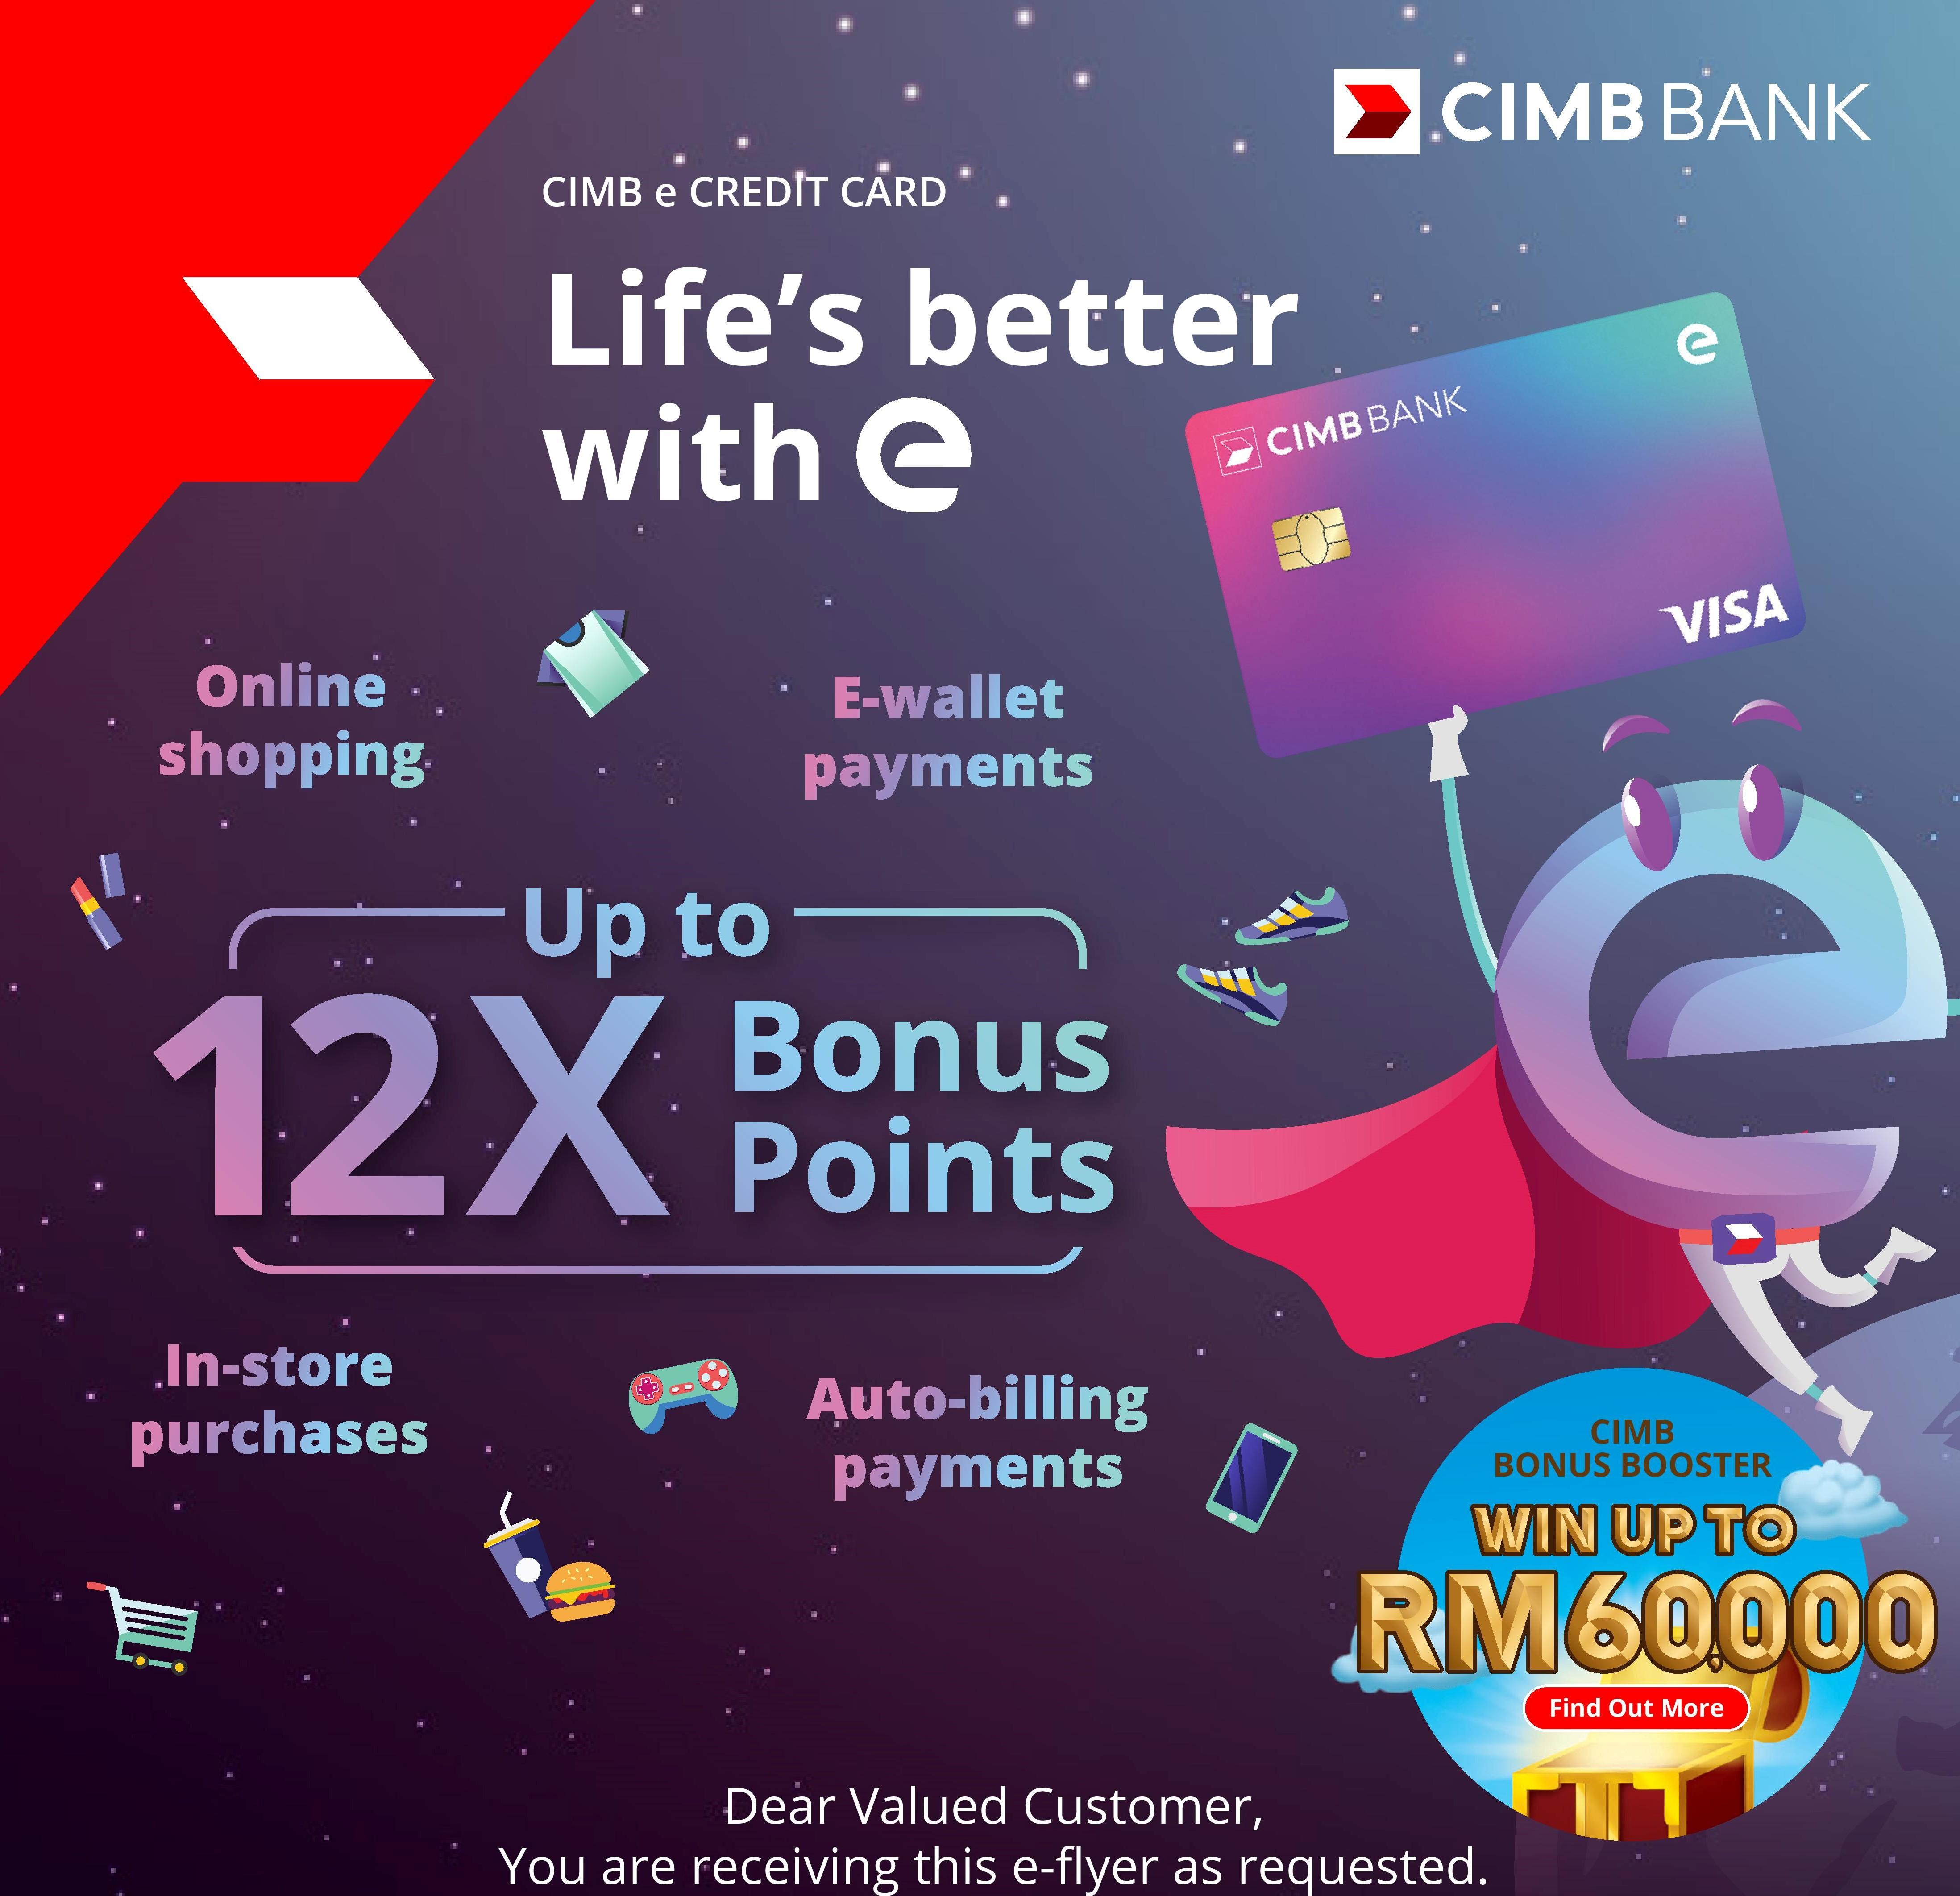 CIMB_e_Credit_Card_-_eFlyer_5.0_FA_clickable-page-002.jpg